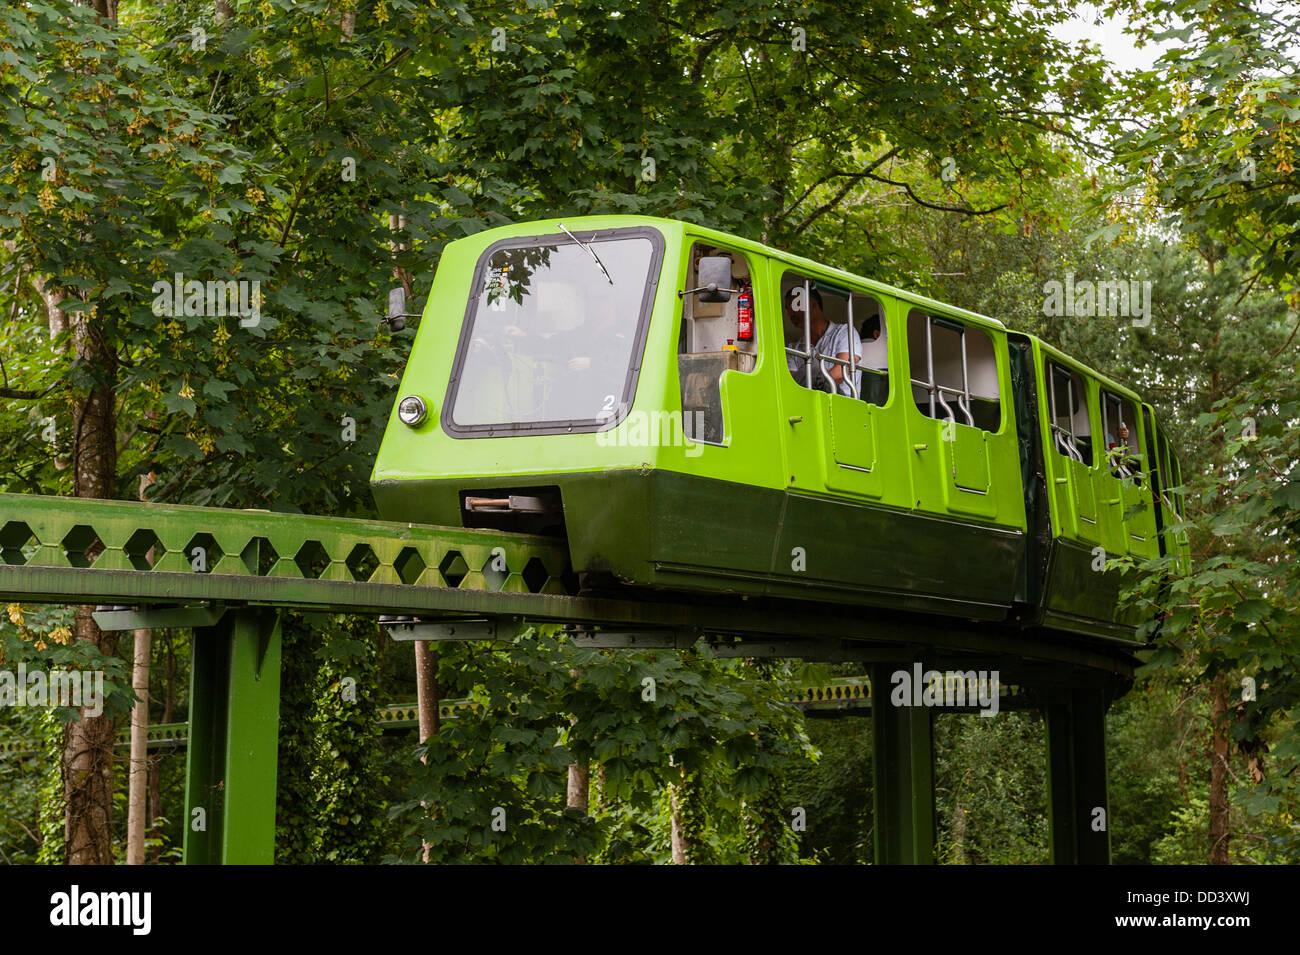 Monorail am National Motor Museum in Beaulieu in Beaulieu, Hampshire, England, Großbritannien, Uk Stockbild